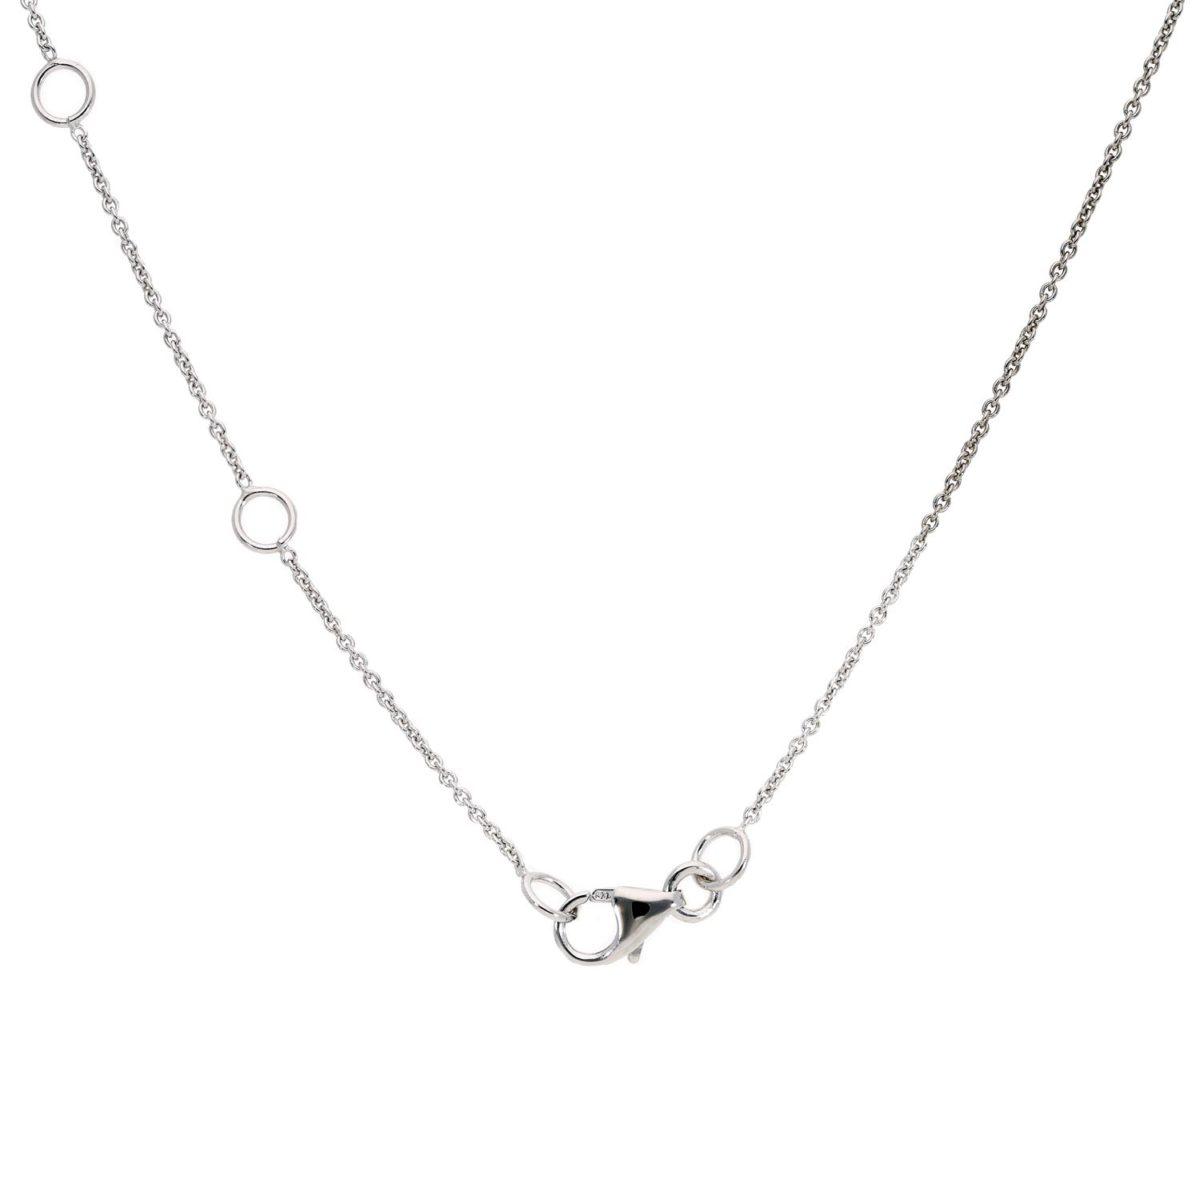 Diamond NecklaceStyle #: ROY-WC9739D